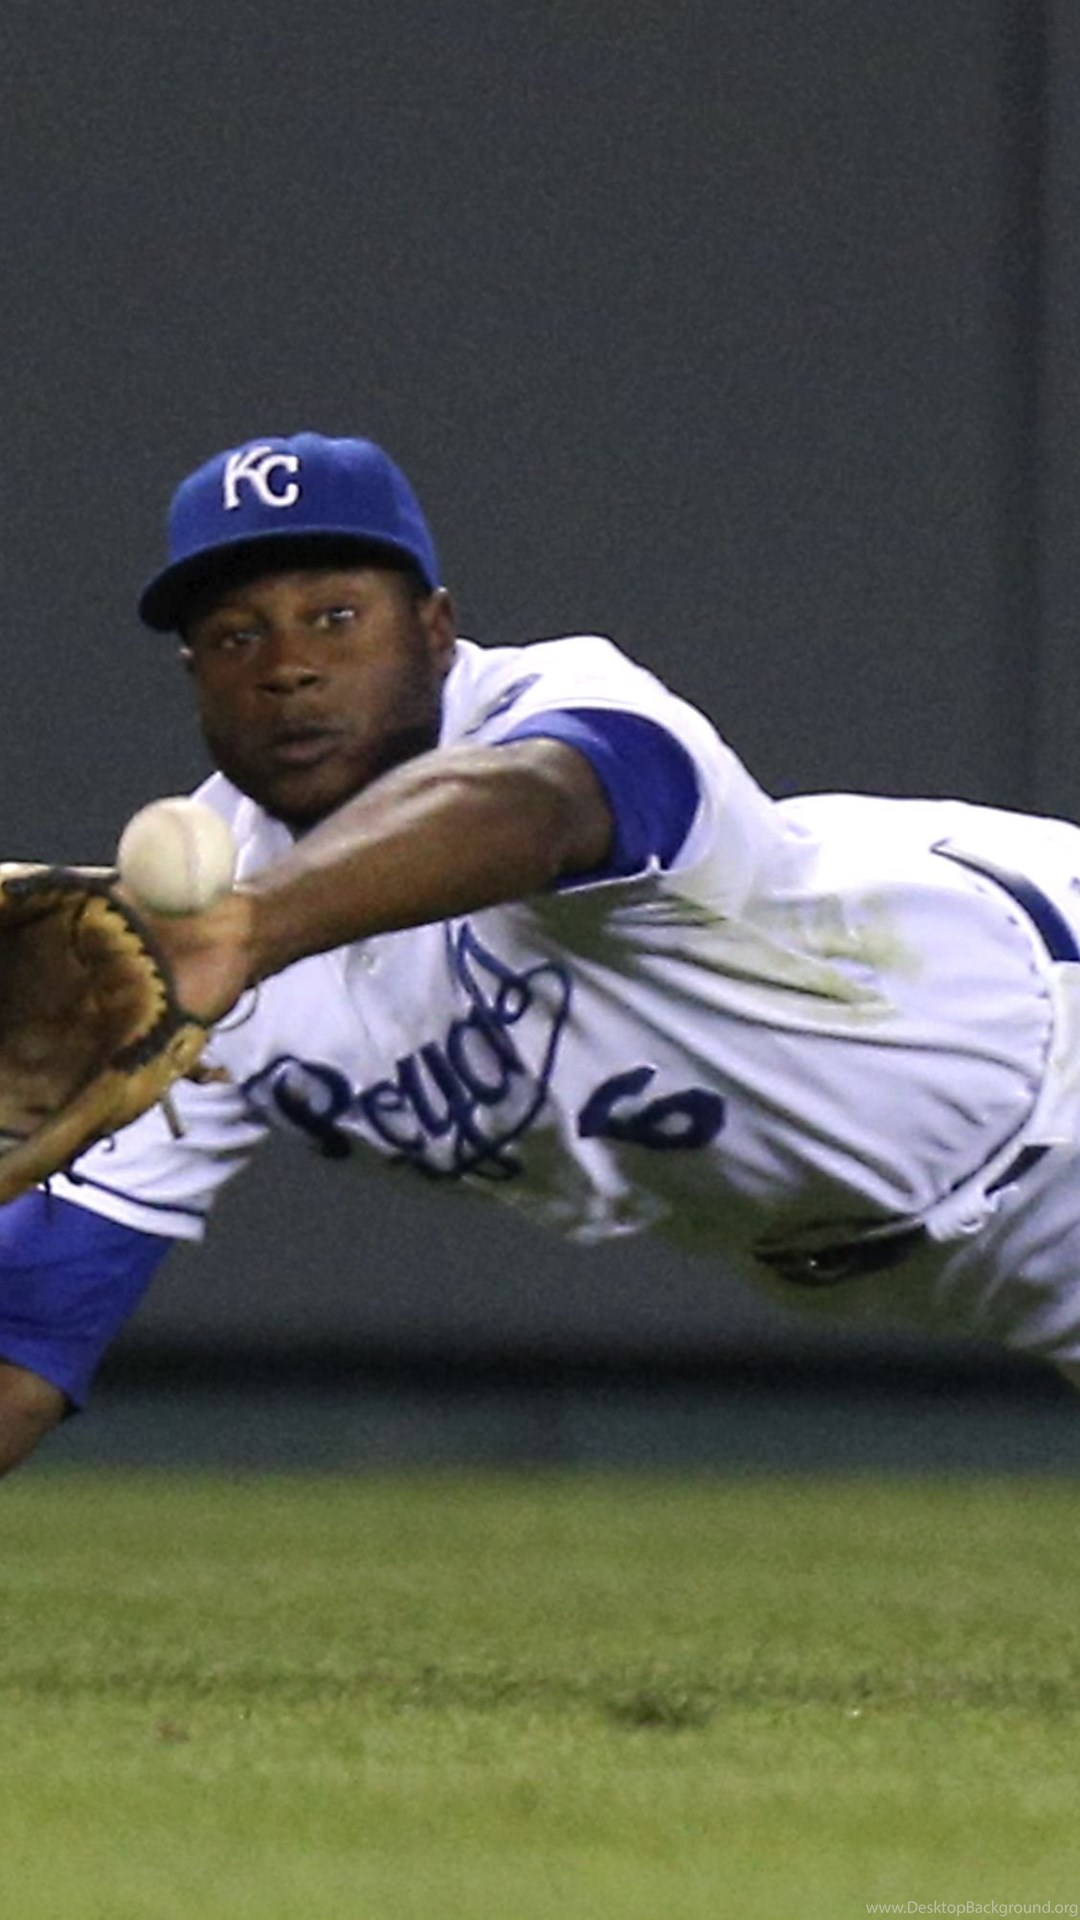 KANSAS CITY ROYALS Mlb Baseball 27 Wallpapers Desktop